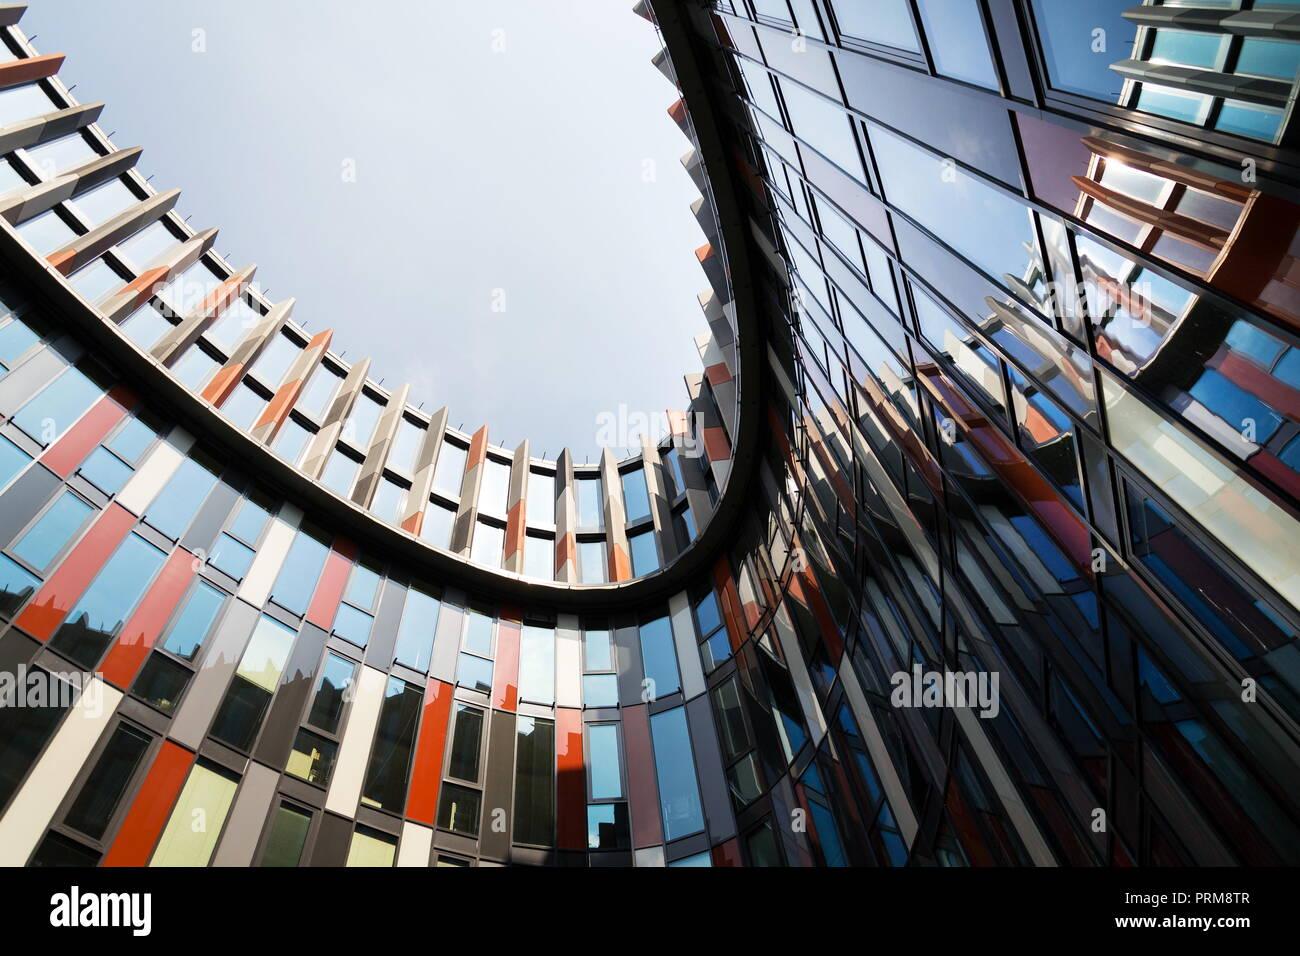 Brise Soleil Sun Breakers On Modern Office Building Facade Global